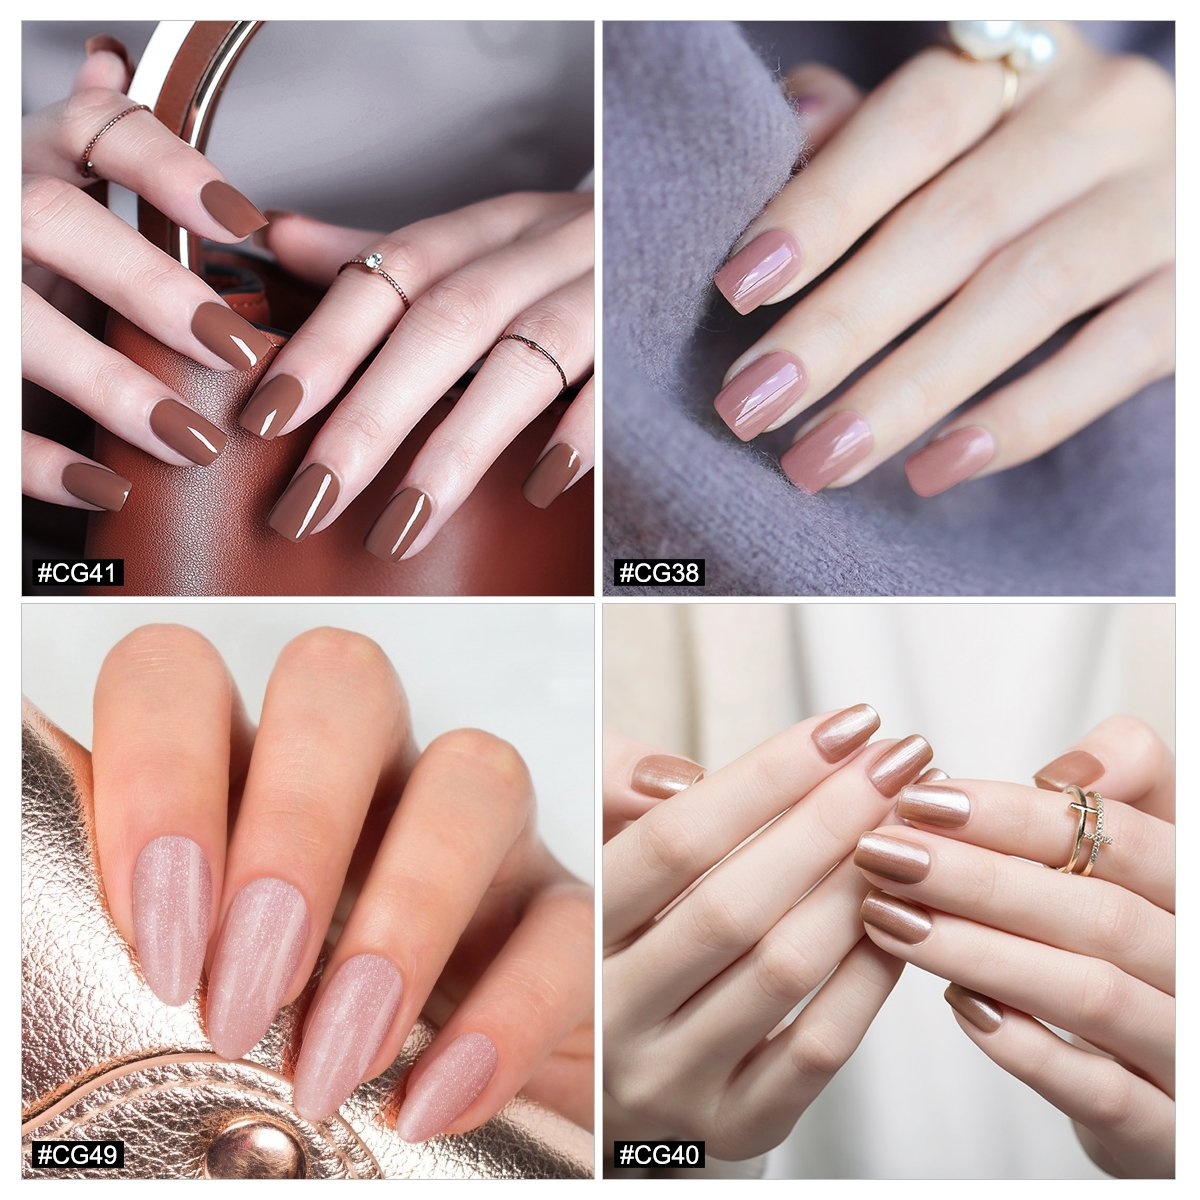 Amazon.com : Azure Beauty Soak Off UV LED Gel Nail Polish for Nails ...